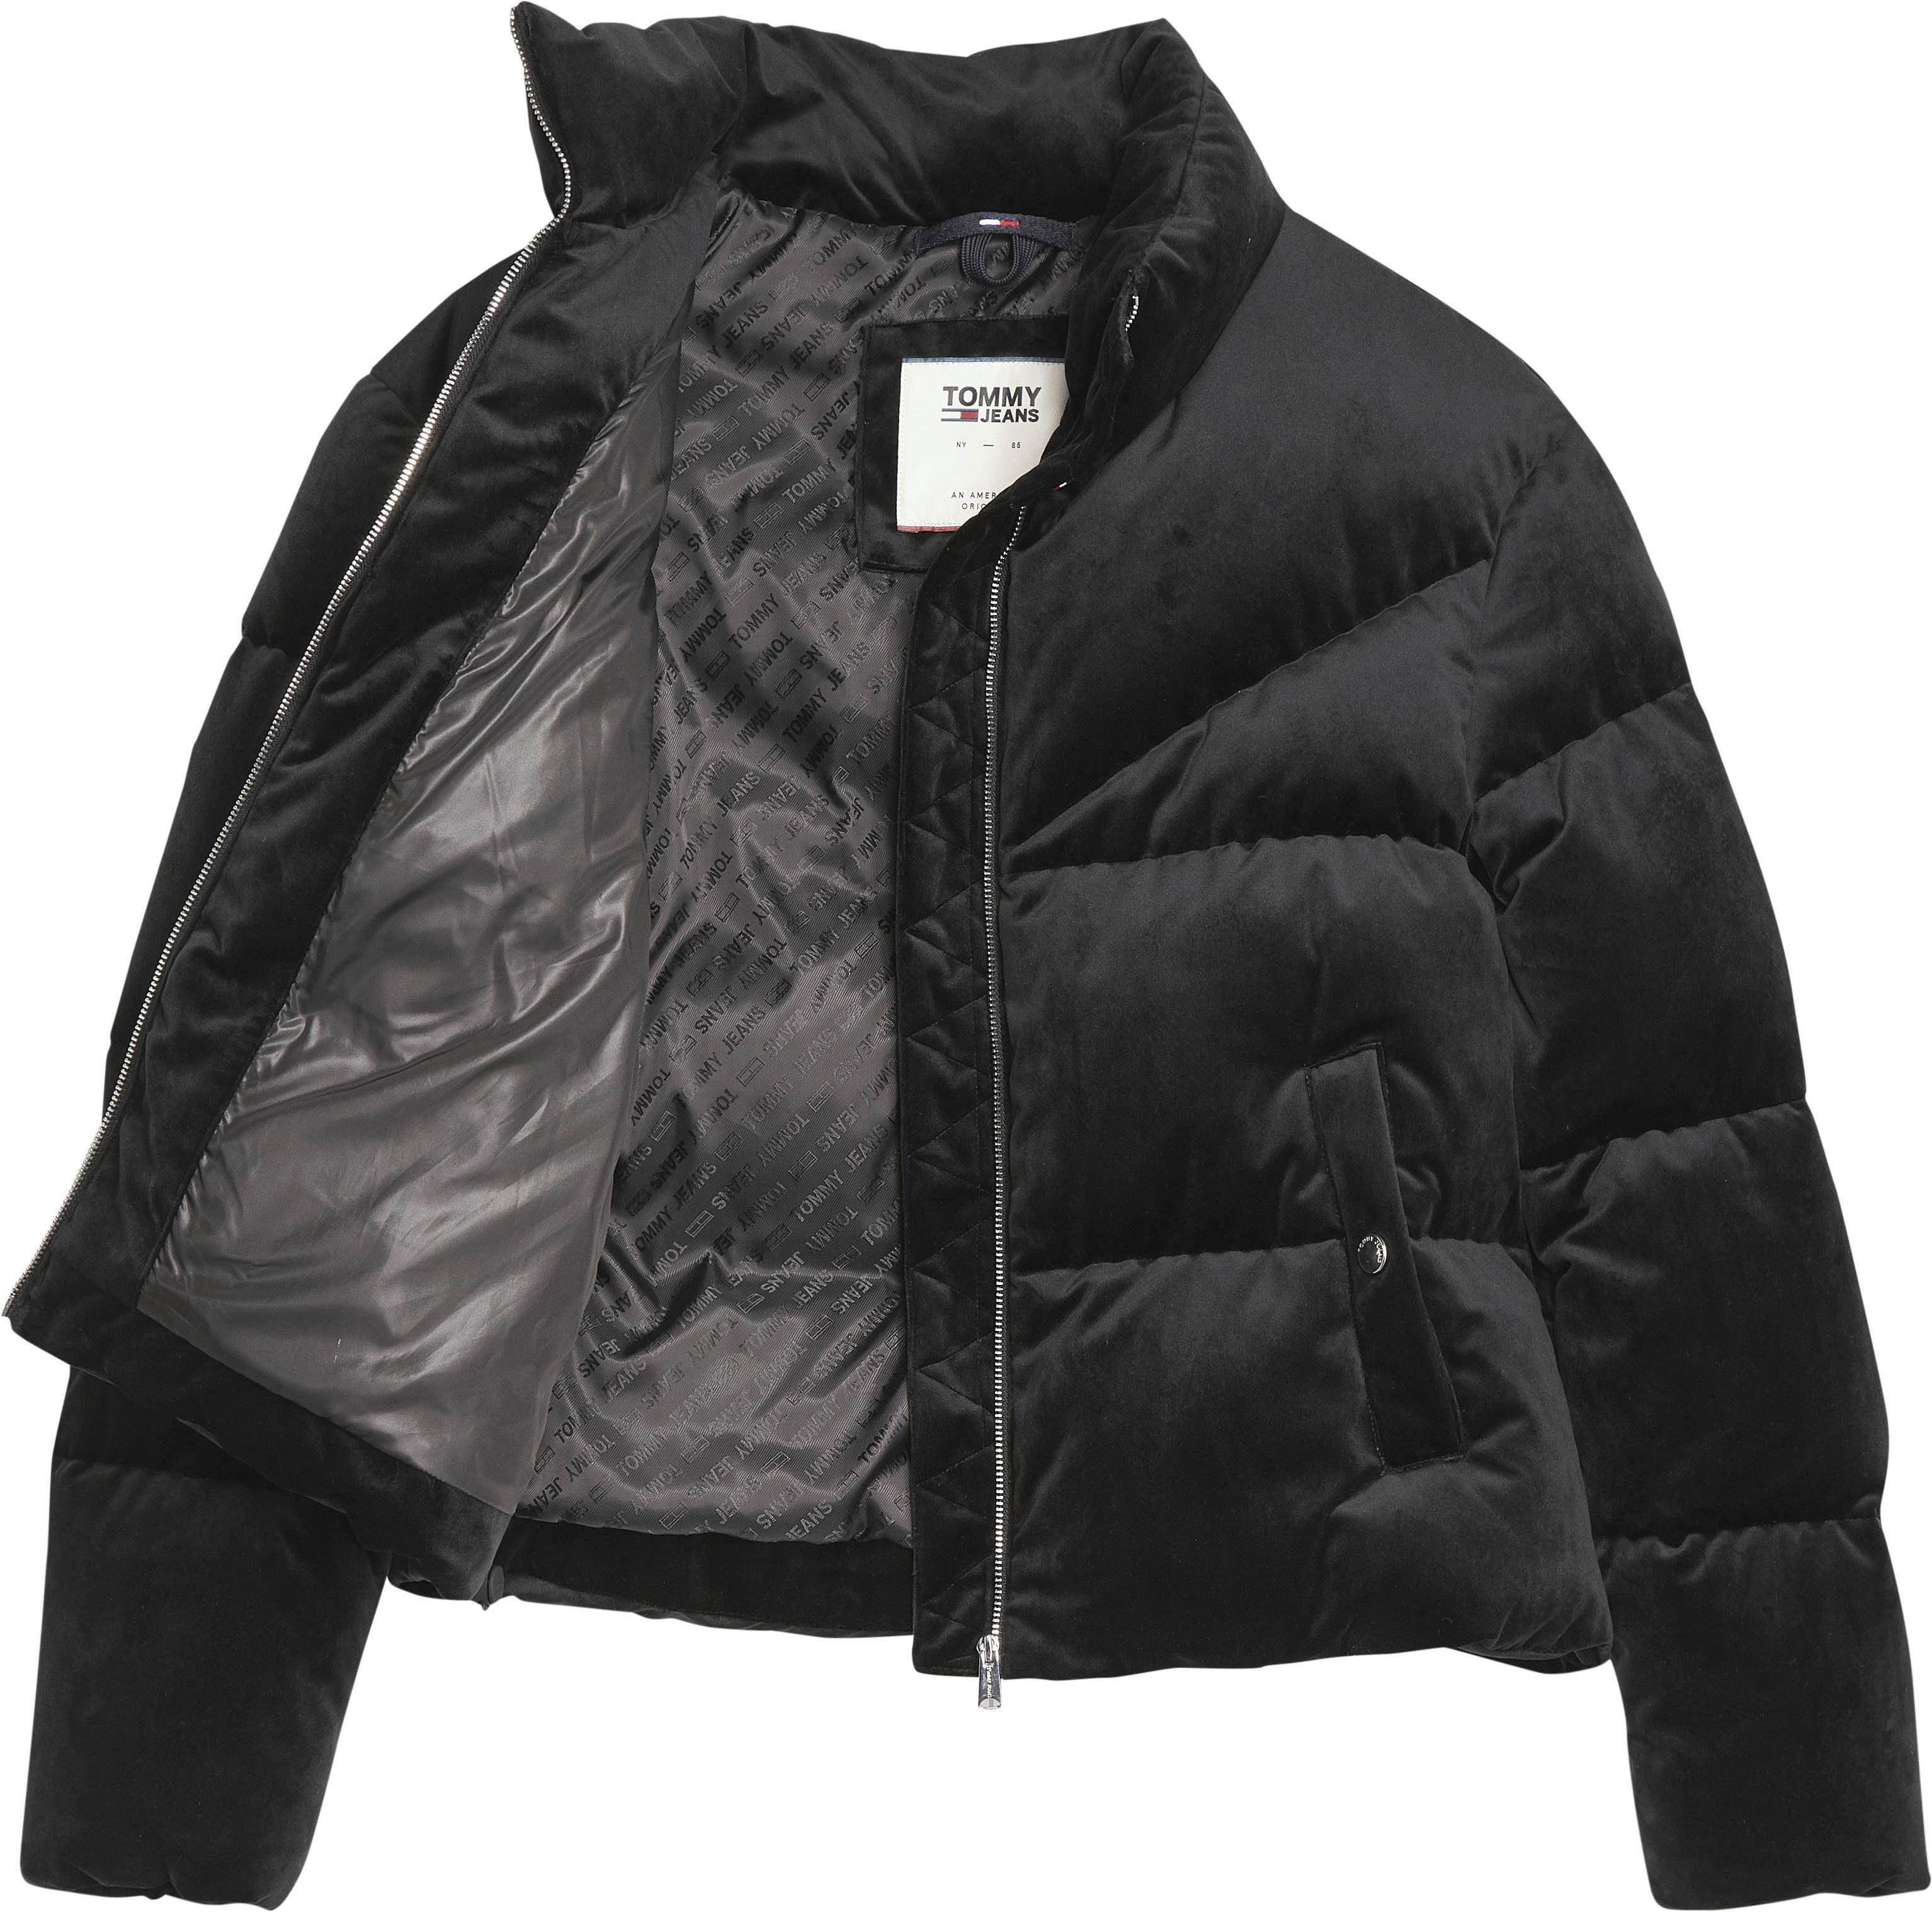 Tommy Jeans Gewatteerde Jas Tjw Velvet Puffa Jacket Nu Online Bestellen - Geweldige Prijs